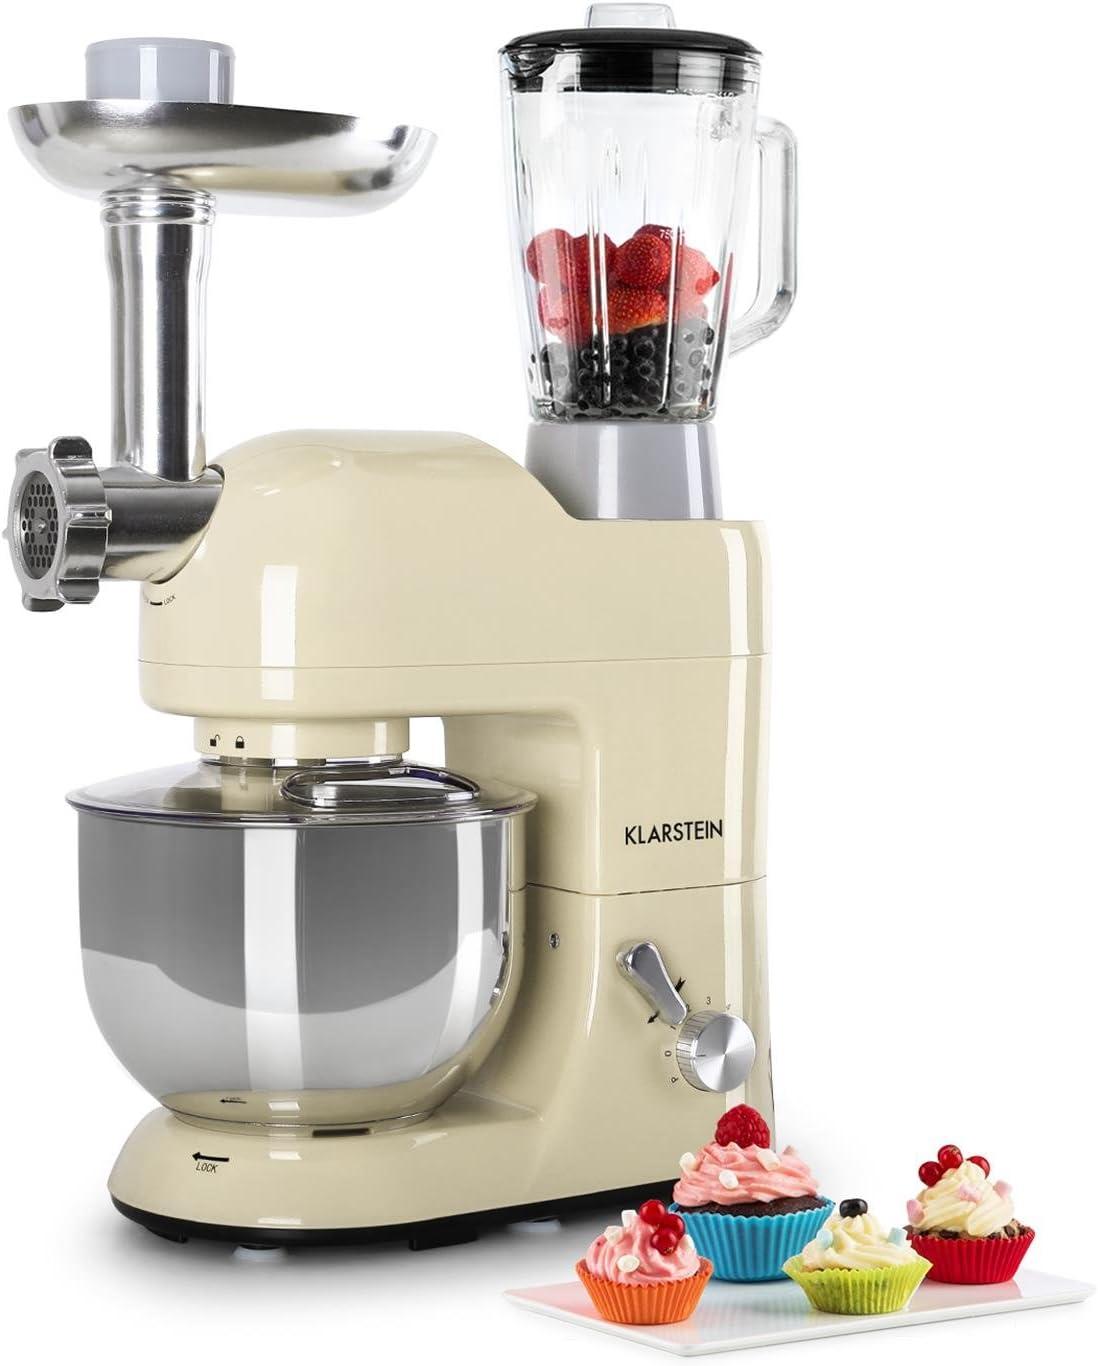 Klarstein Lucia Morena - Robot de cocina universal, Batidora ...